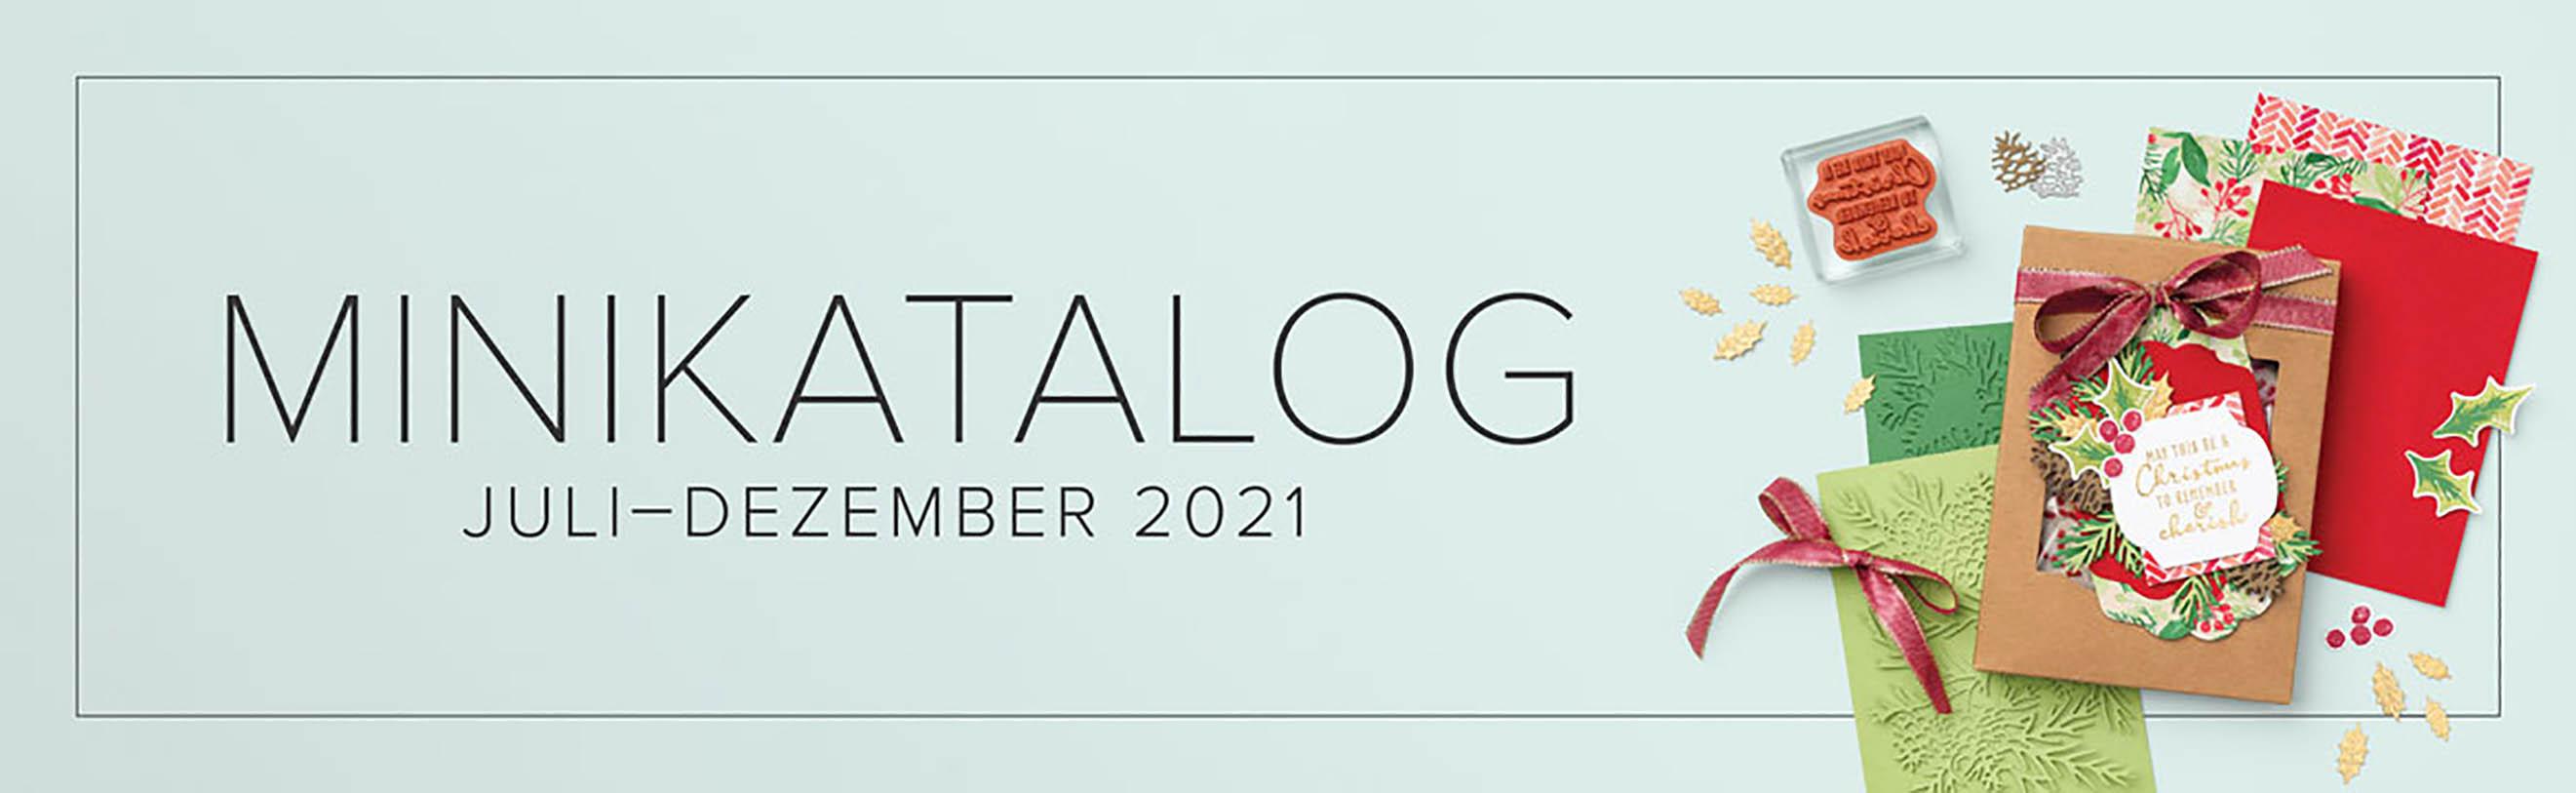 Minikatalog Juli – Dezember 2021